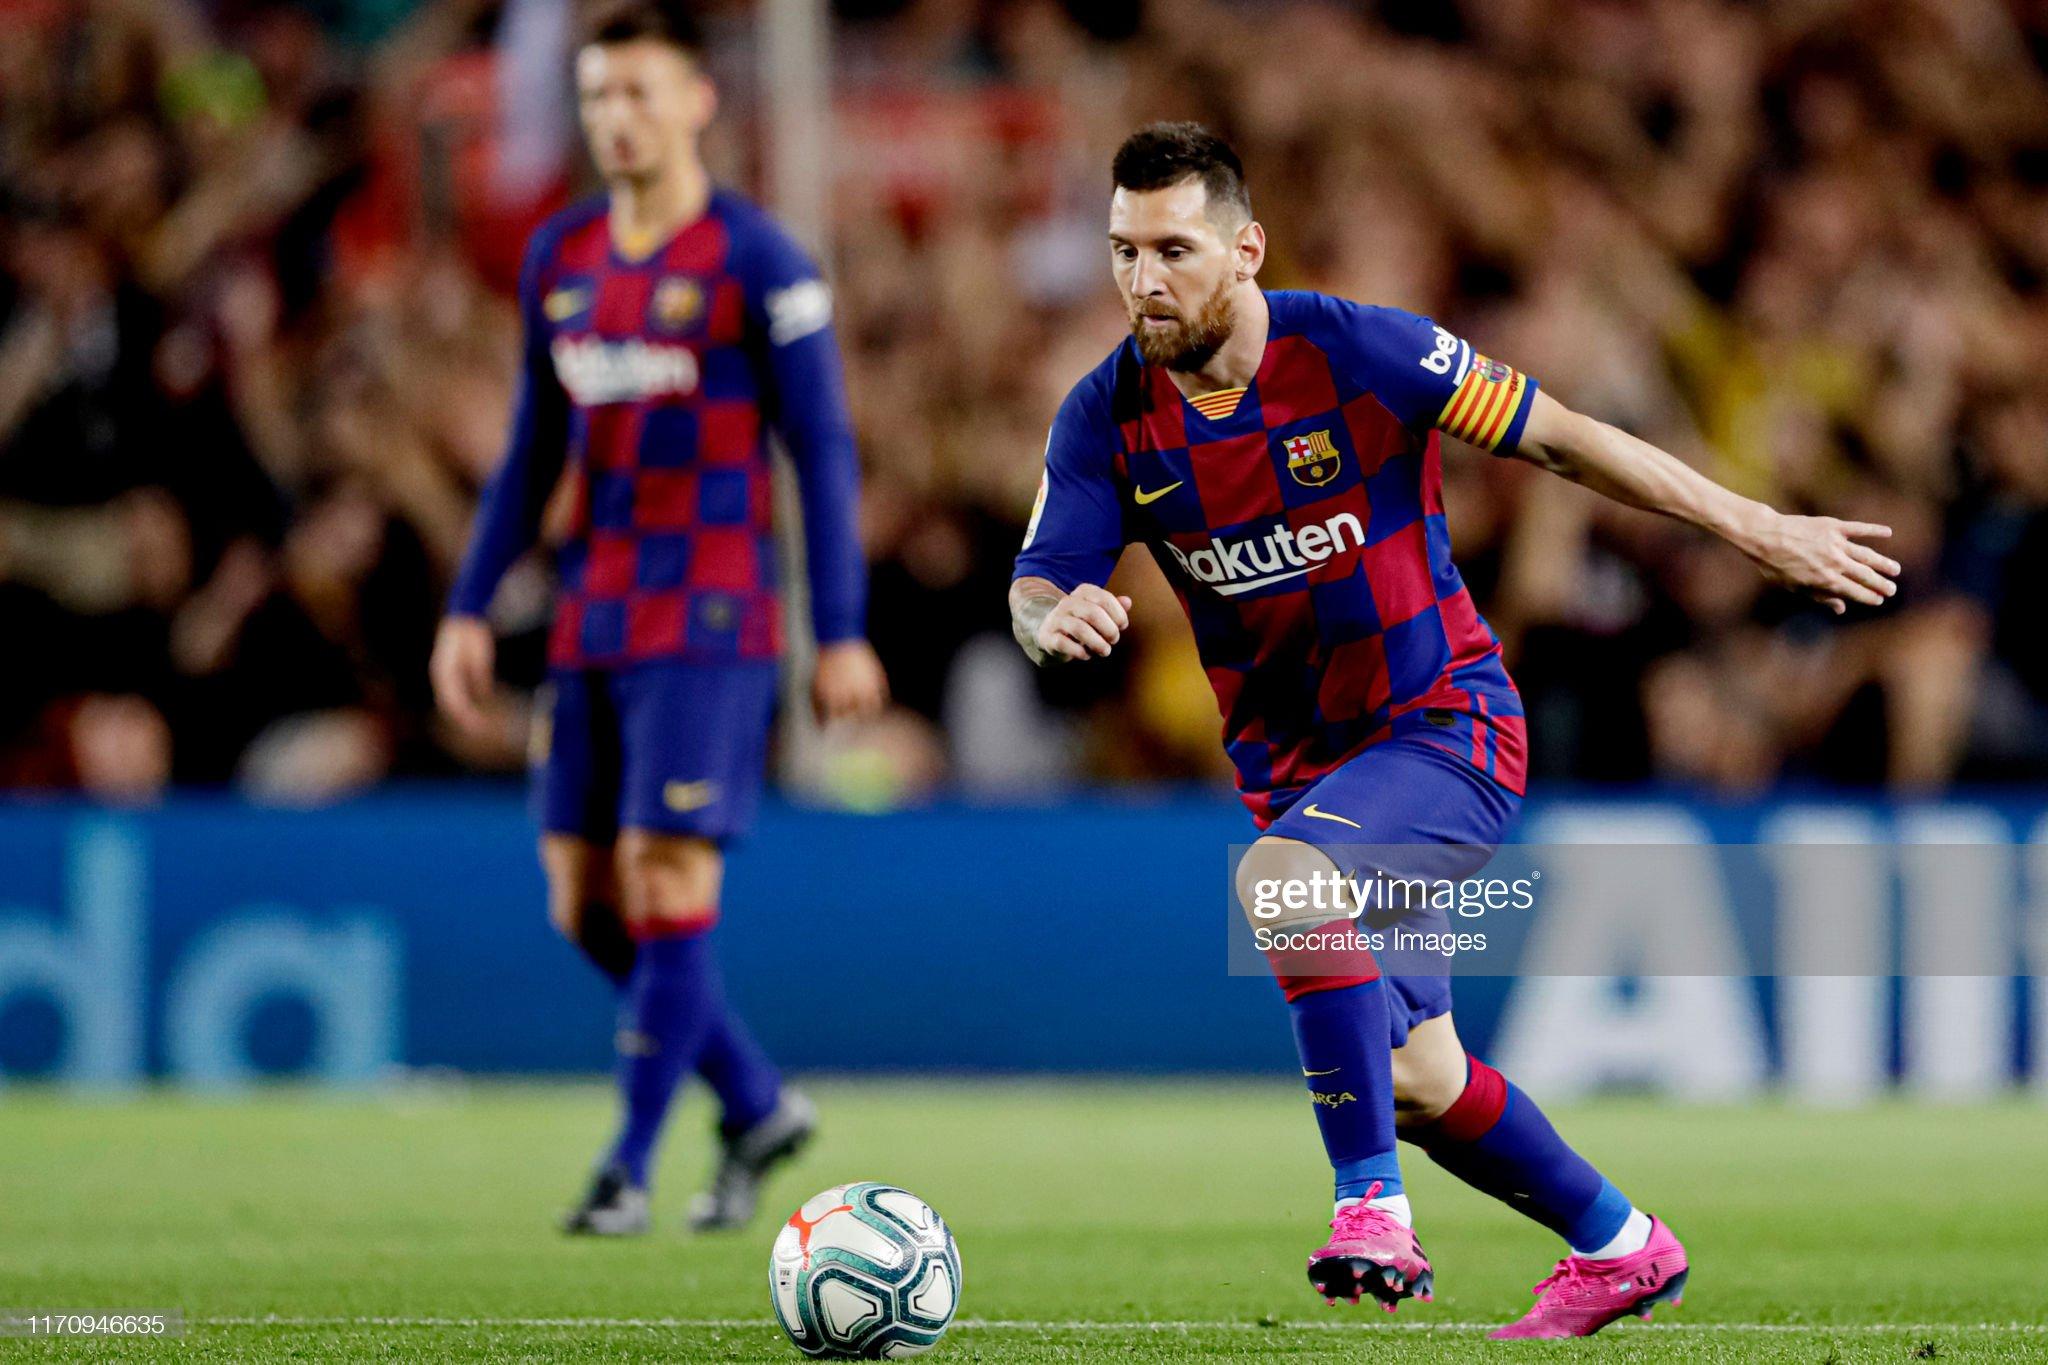 صور مباراة : برشلونة - فياريال 2-1 ( 24-09-2019 )  Lionel-messi-of-fc-barcelona-during-the-la-liga-santander-match-fc-picture-id1170946635?s=2048x2048